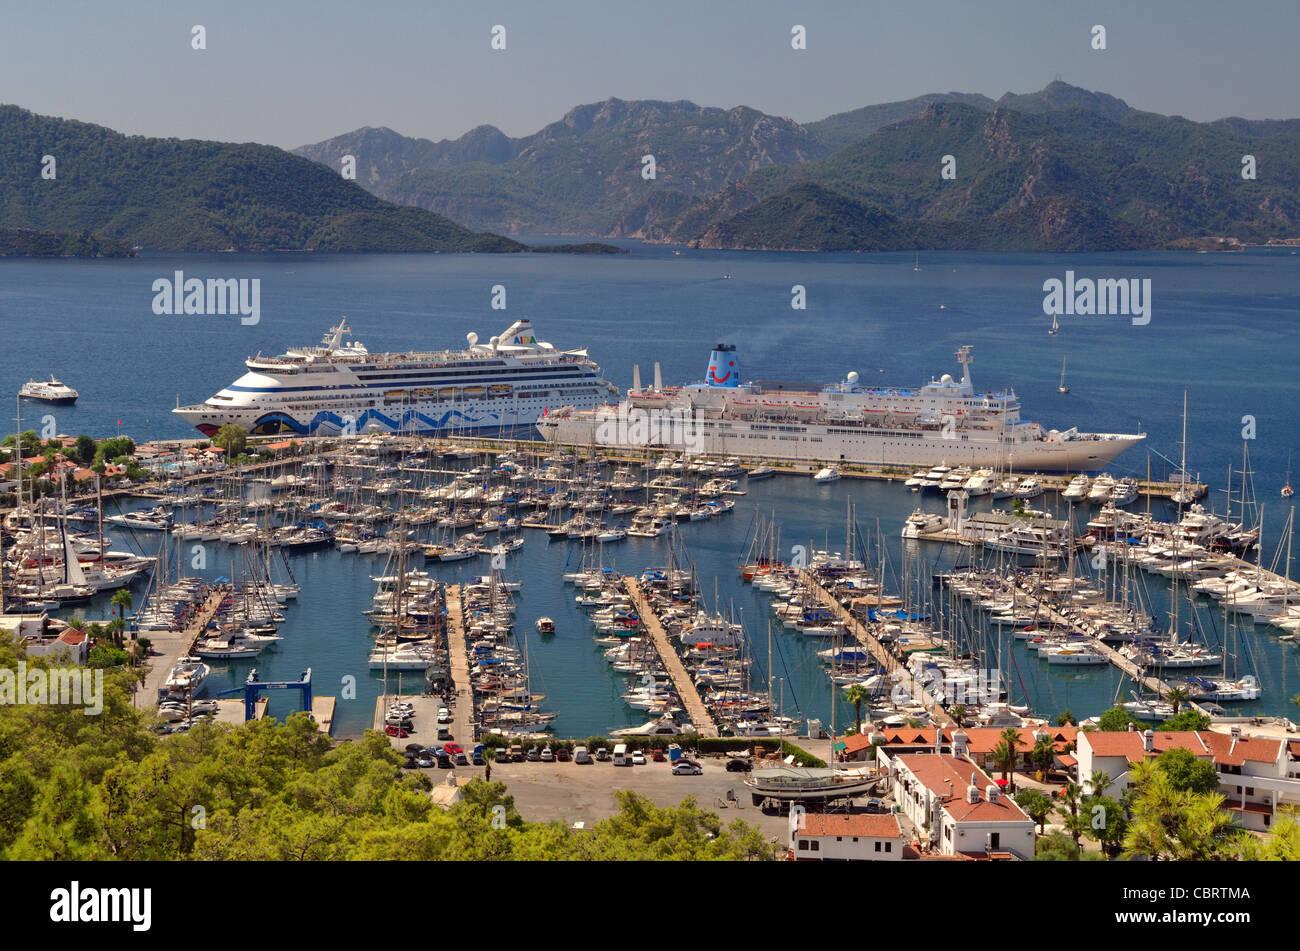 Cruise port with Thomson 'Celebration' ship on quay & Aida 'Aura' ship docking on arrival at - Stock Image